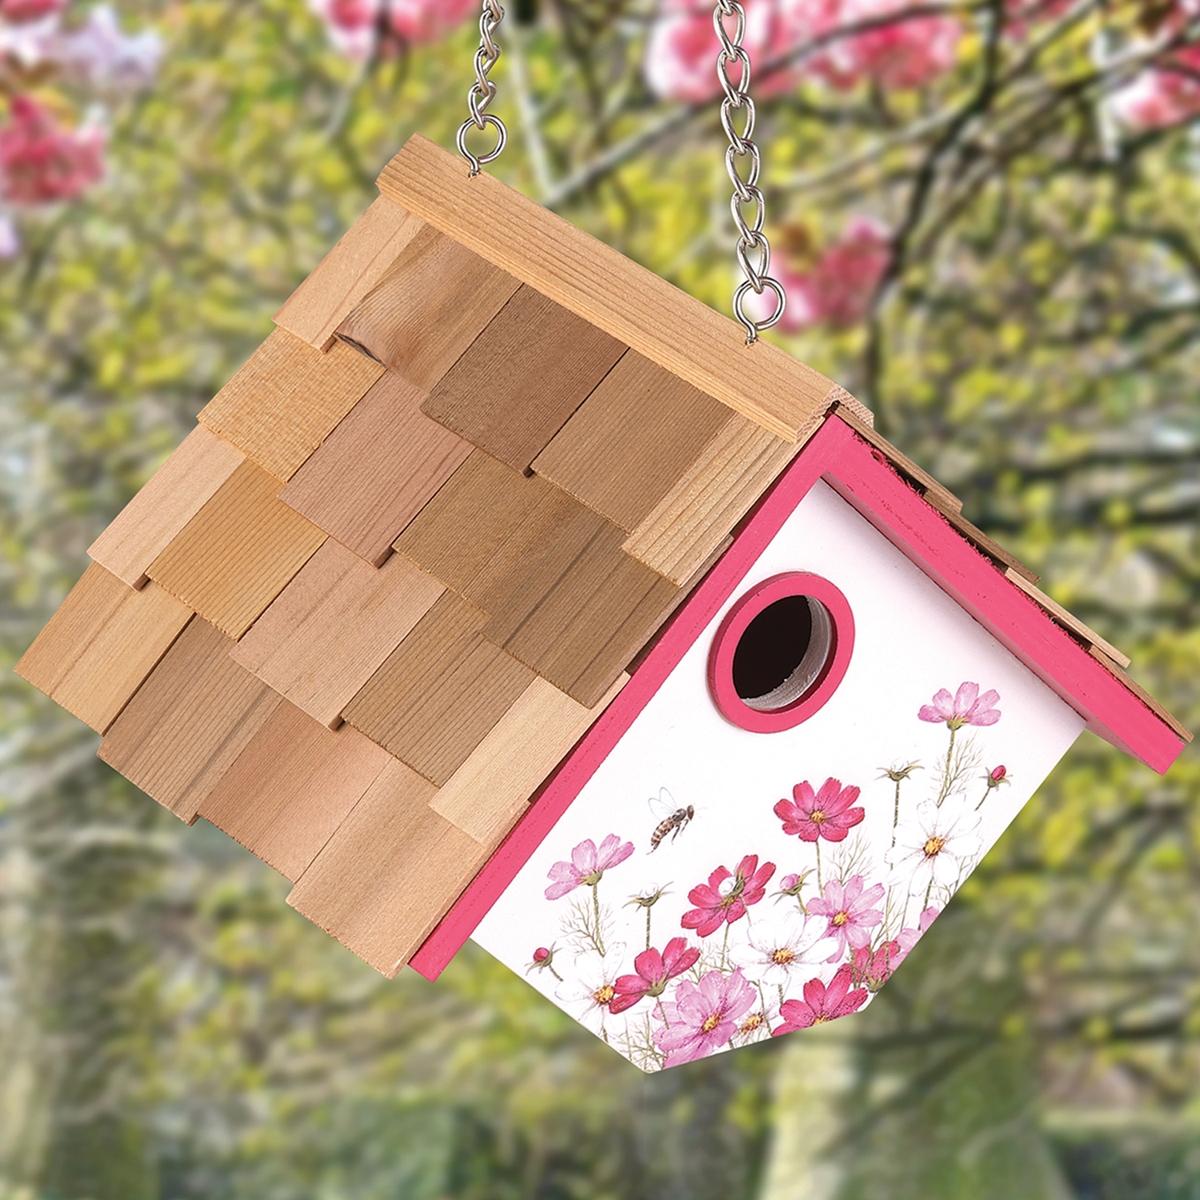 Cosmos Wren Nesting Box